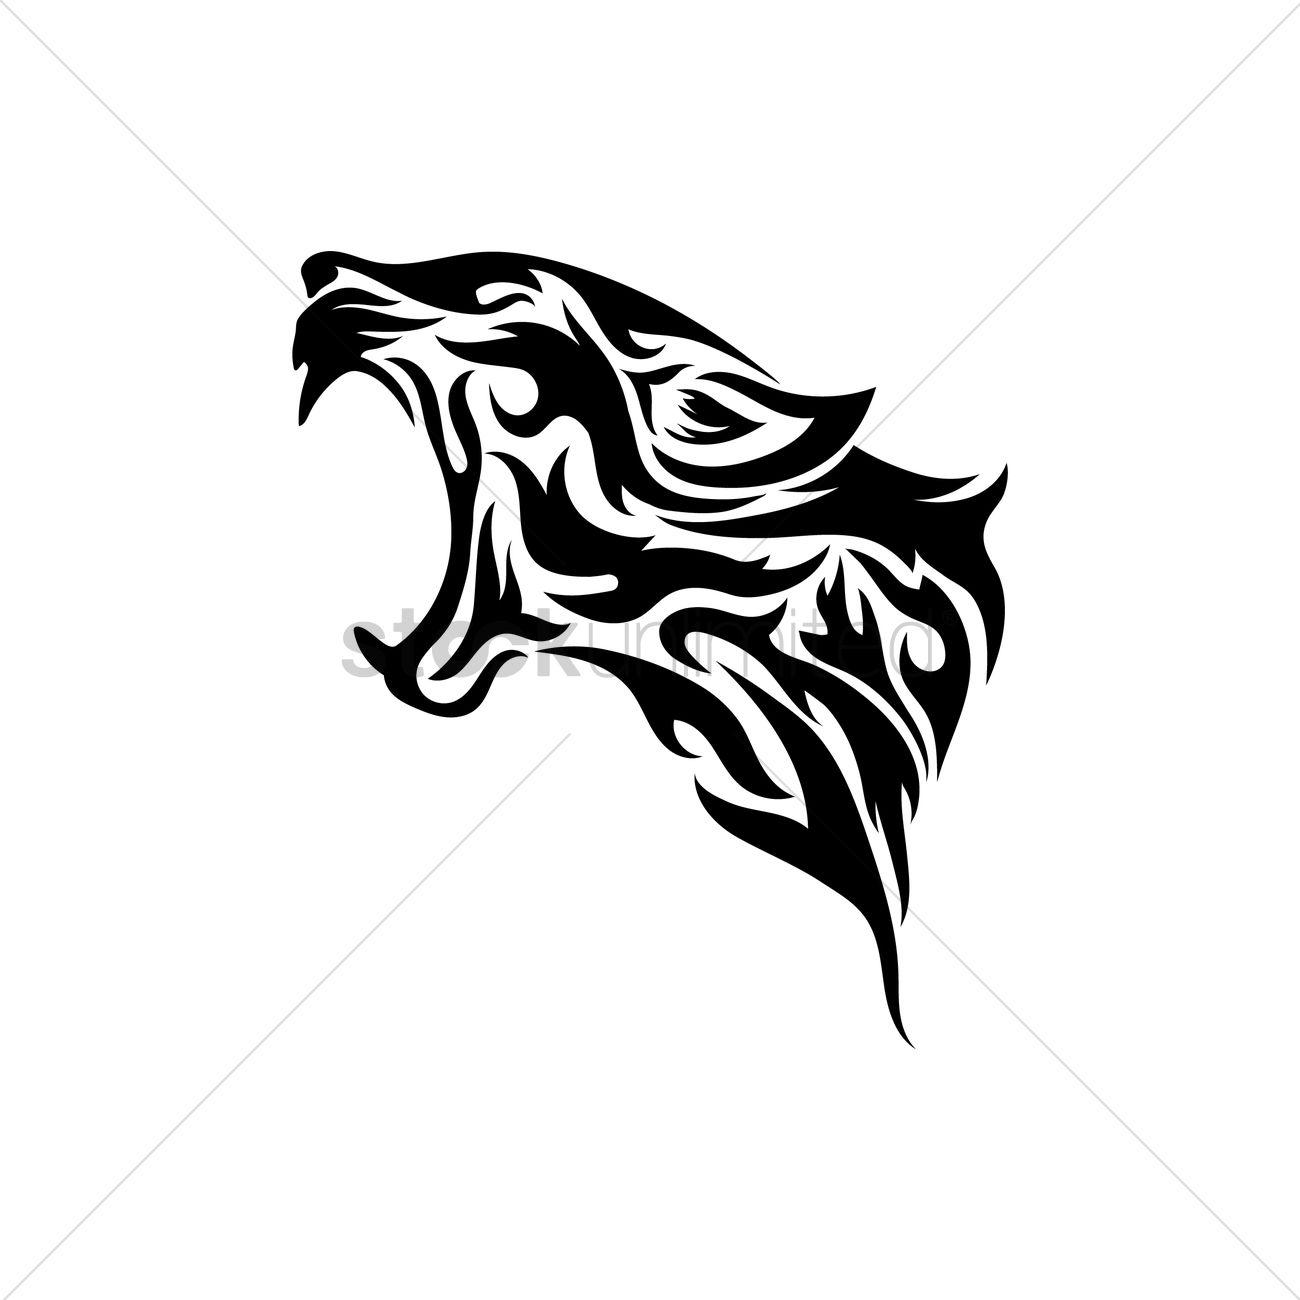 leopard tribal tattoo vector image 1480238 stockunlimited. Black Bedroom Furniture Sets. Home Design Ideas